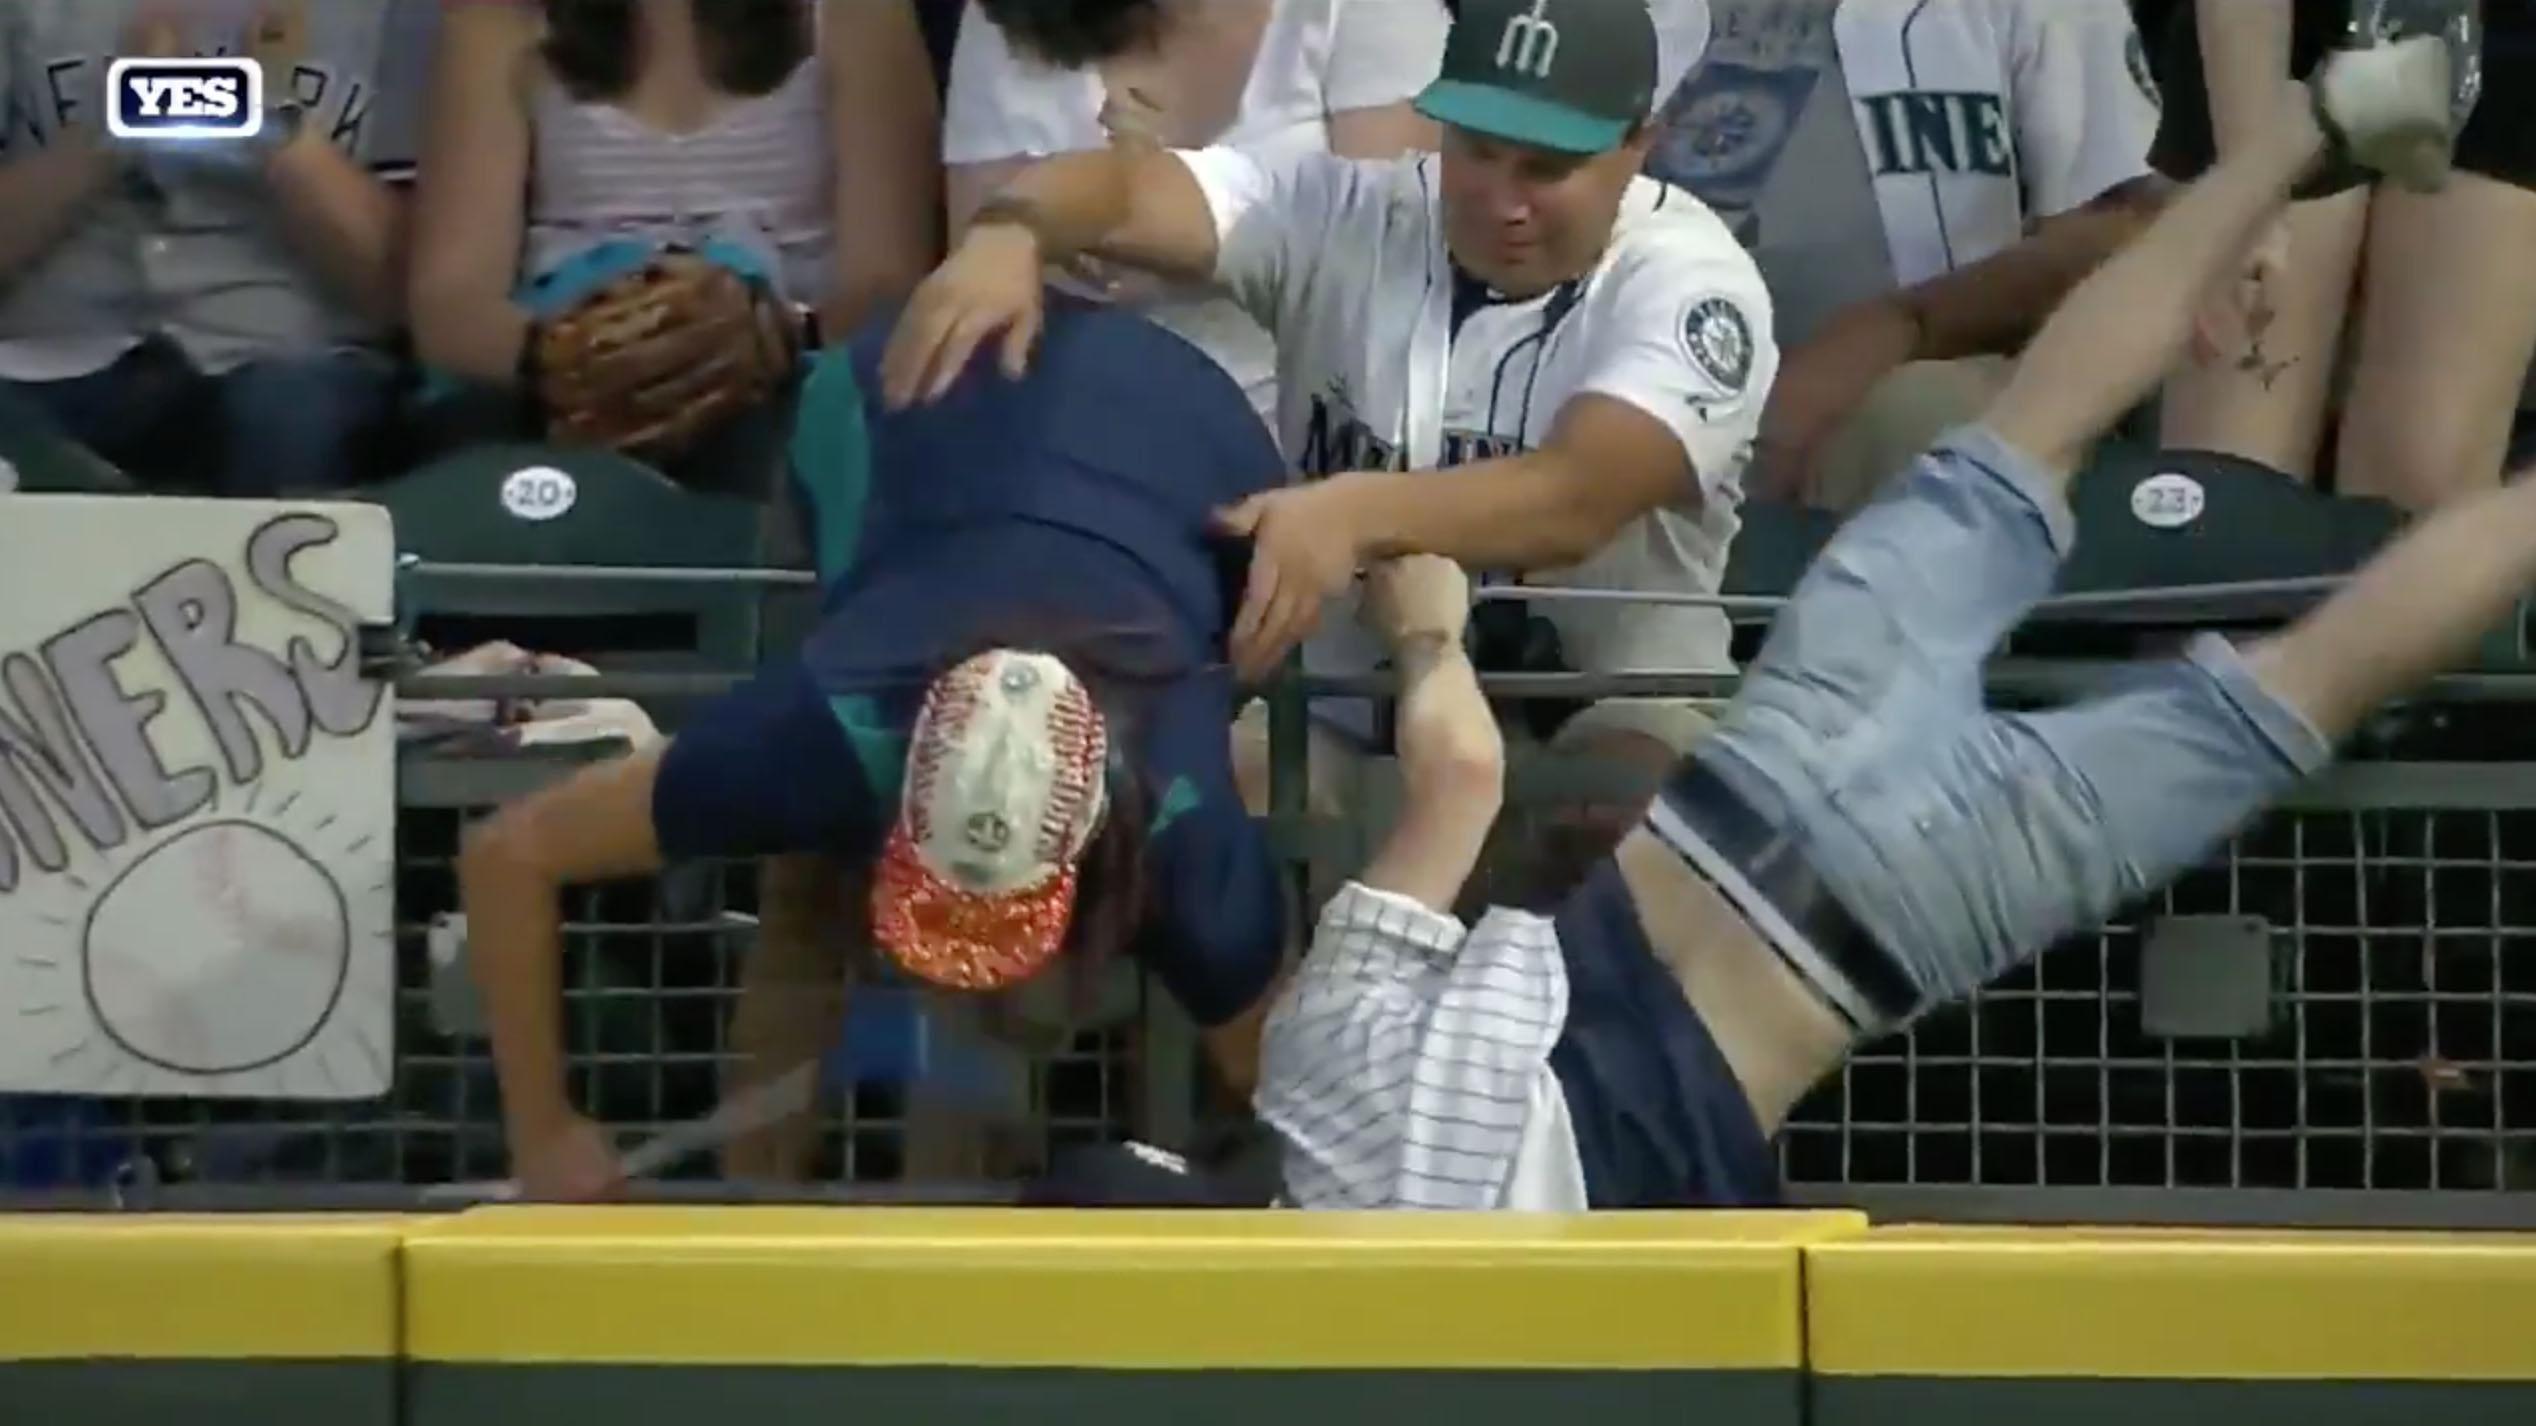 Yankees-Mariners: Fans chase Brett Gardner home run ball (video)